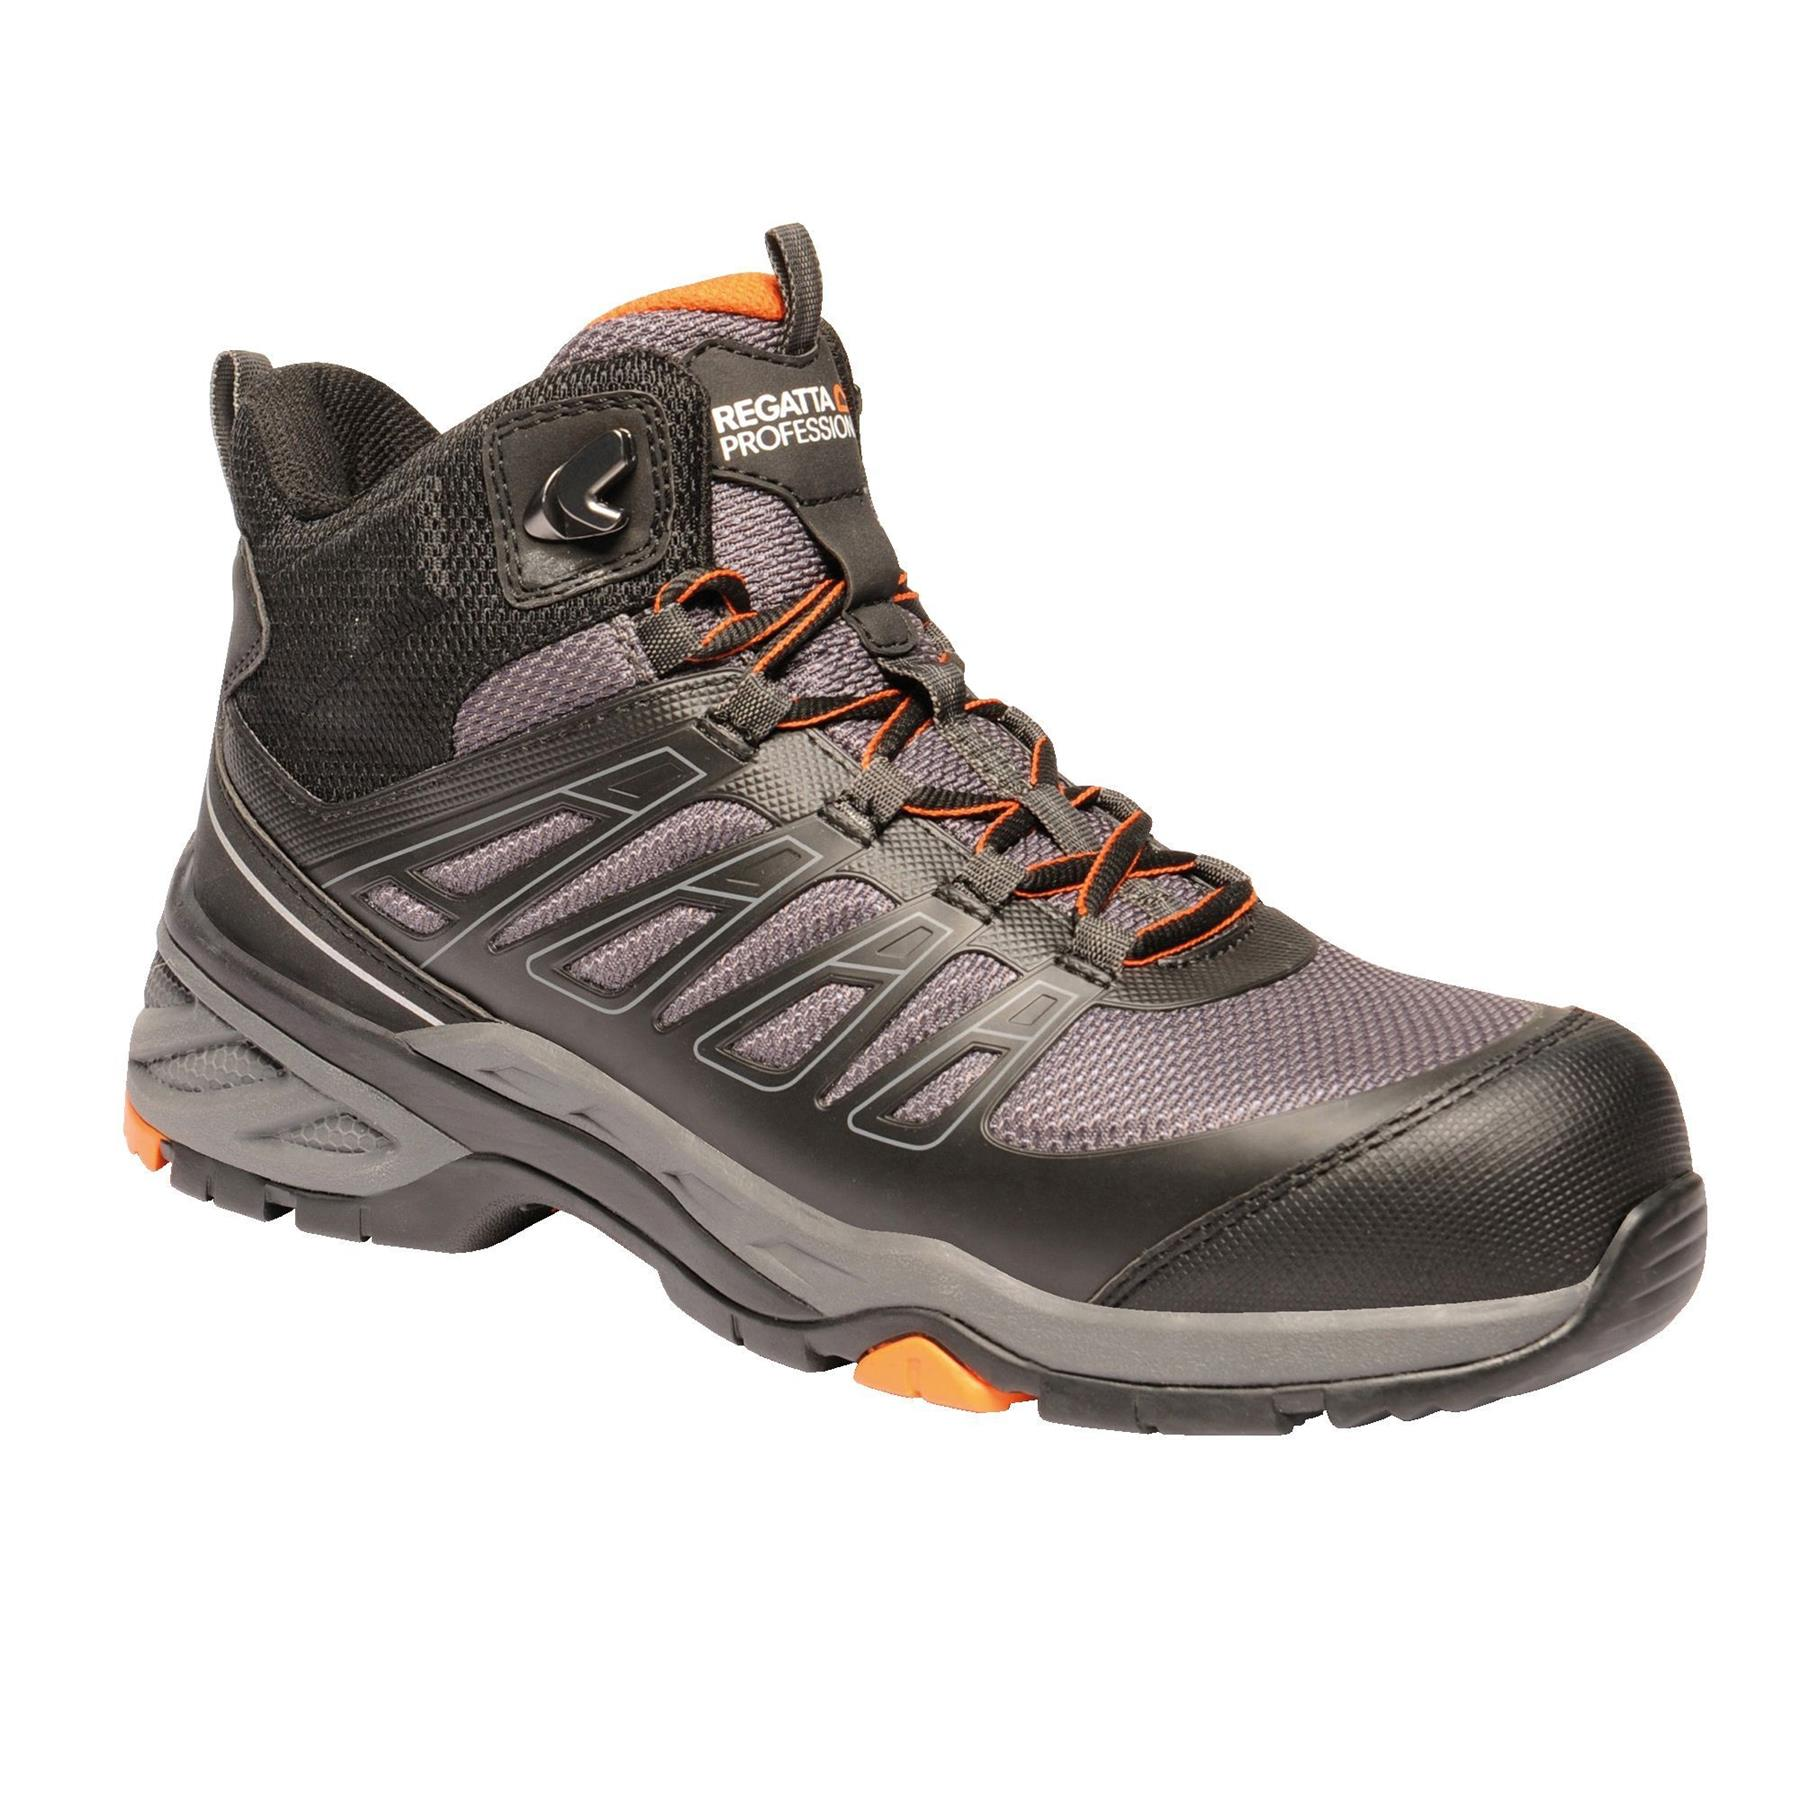 miniatuur 17 - Regatta Mens Work Safety Protective Shoes Steel Toe Cap Boots Workwear